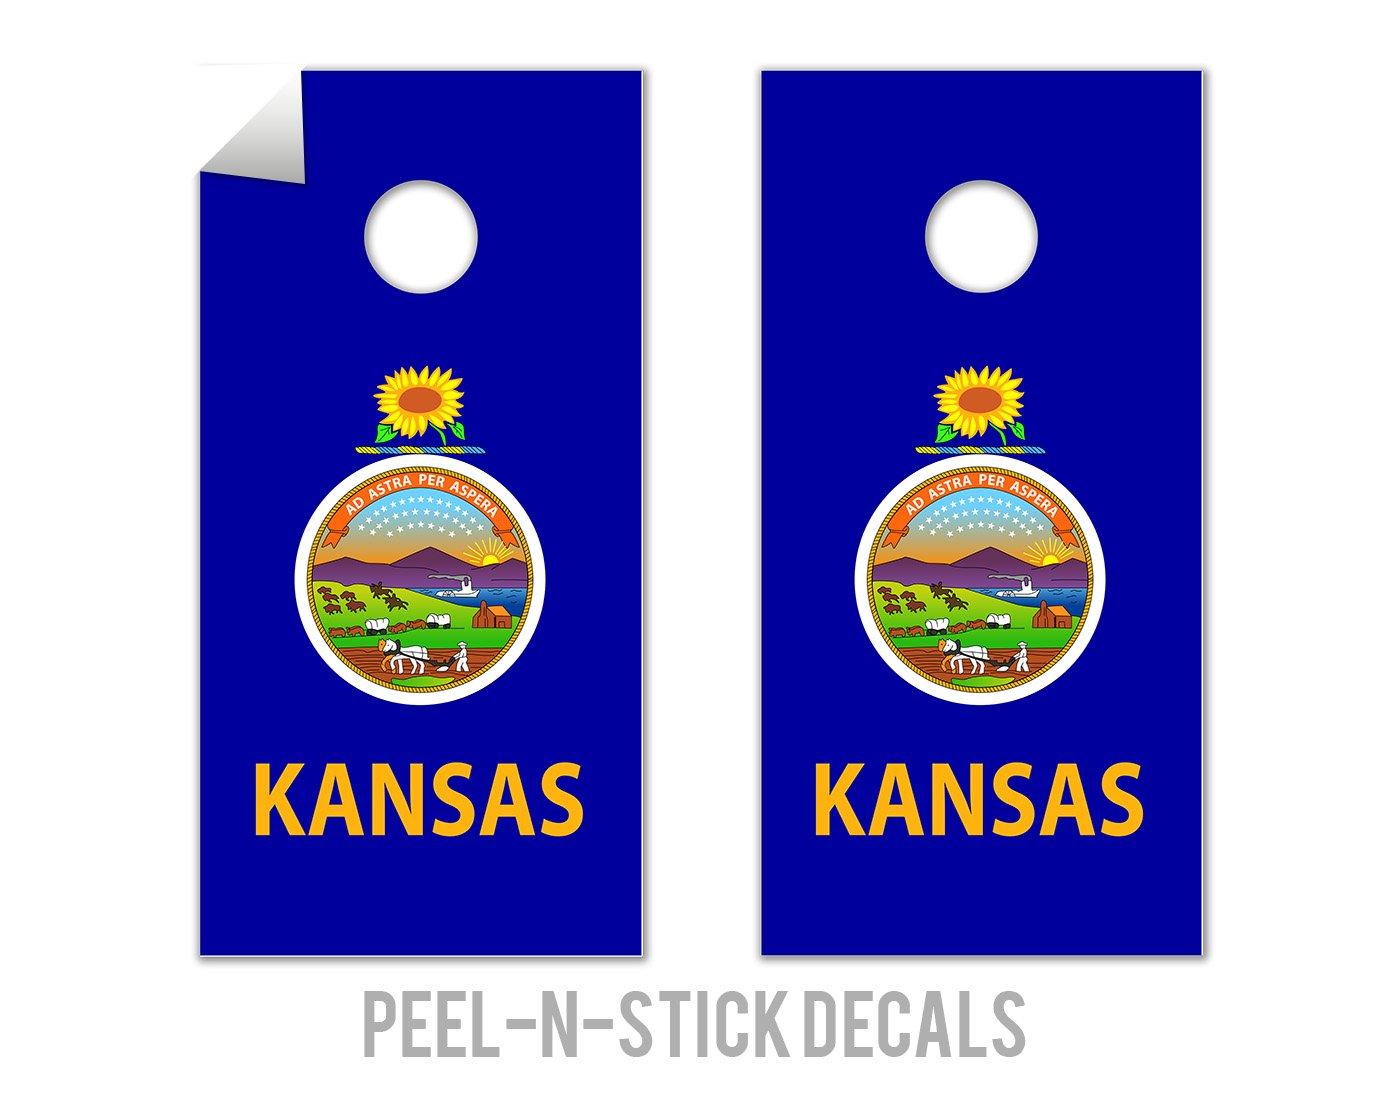 Kansas State Flag - Cornhole Crew - ACA Regulation Size Cornhole Board Decals by The Cornhole Crew